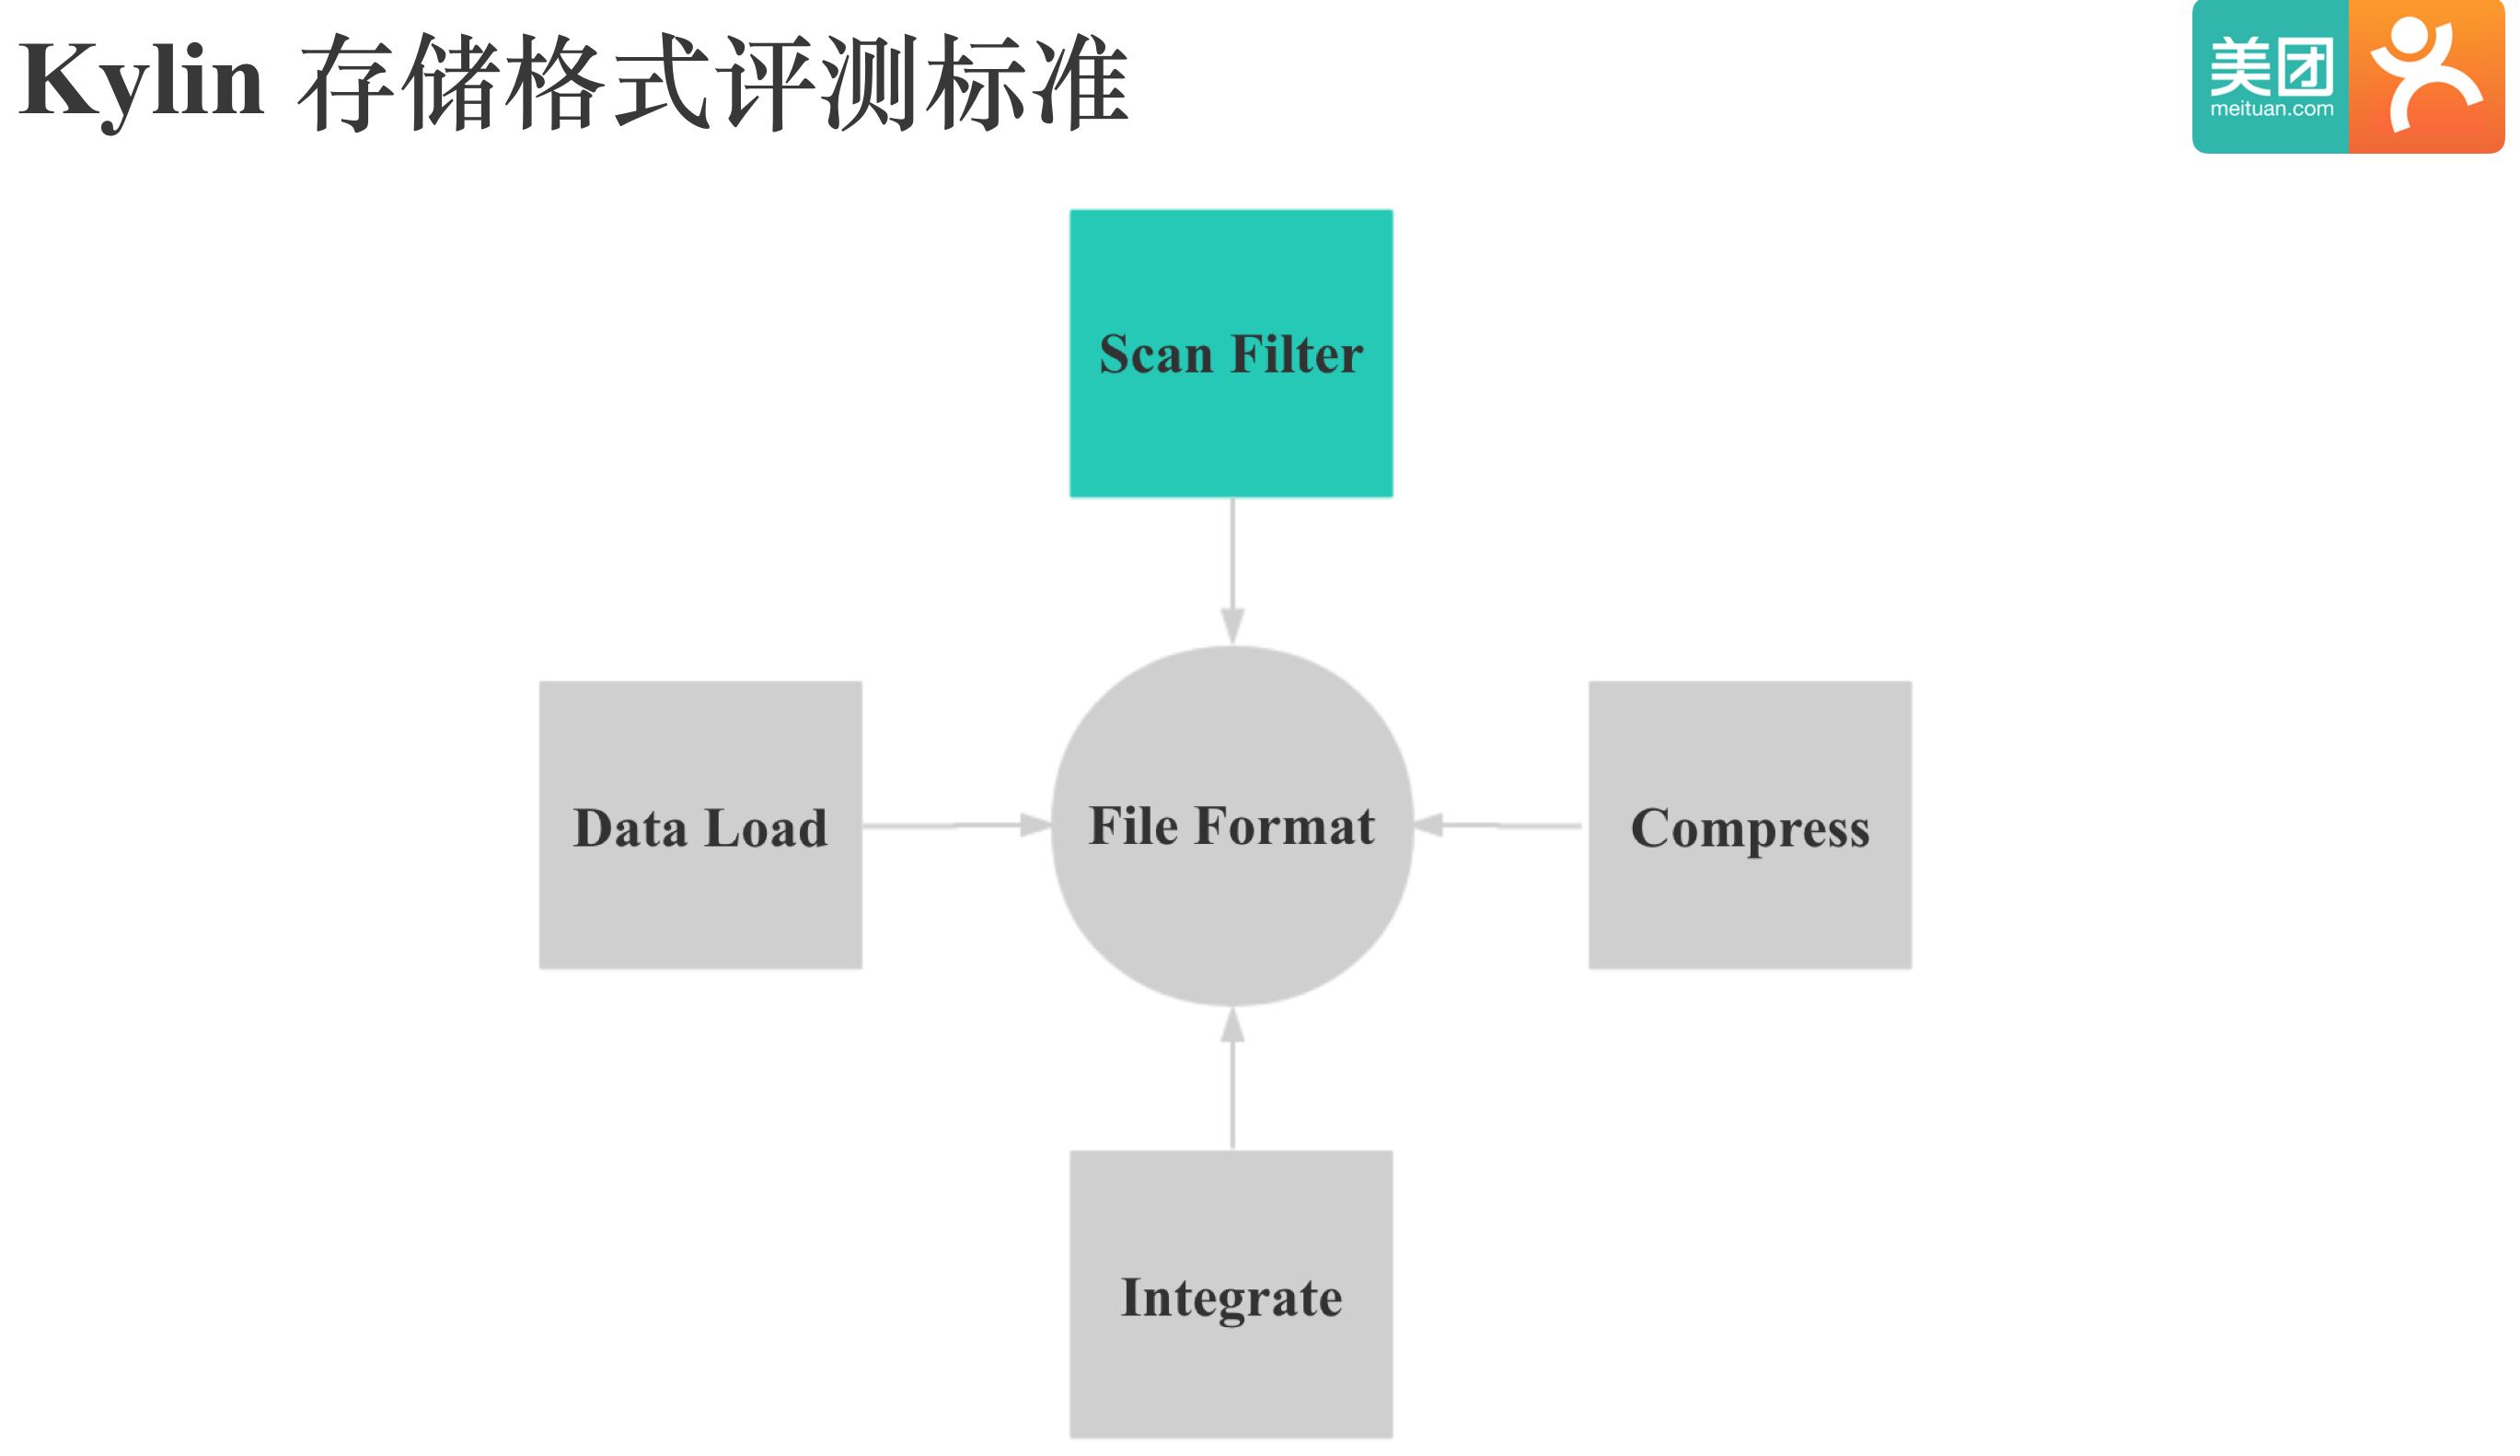 Kylin存储格式评测标准